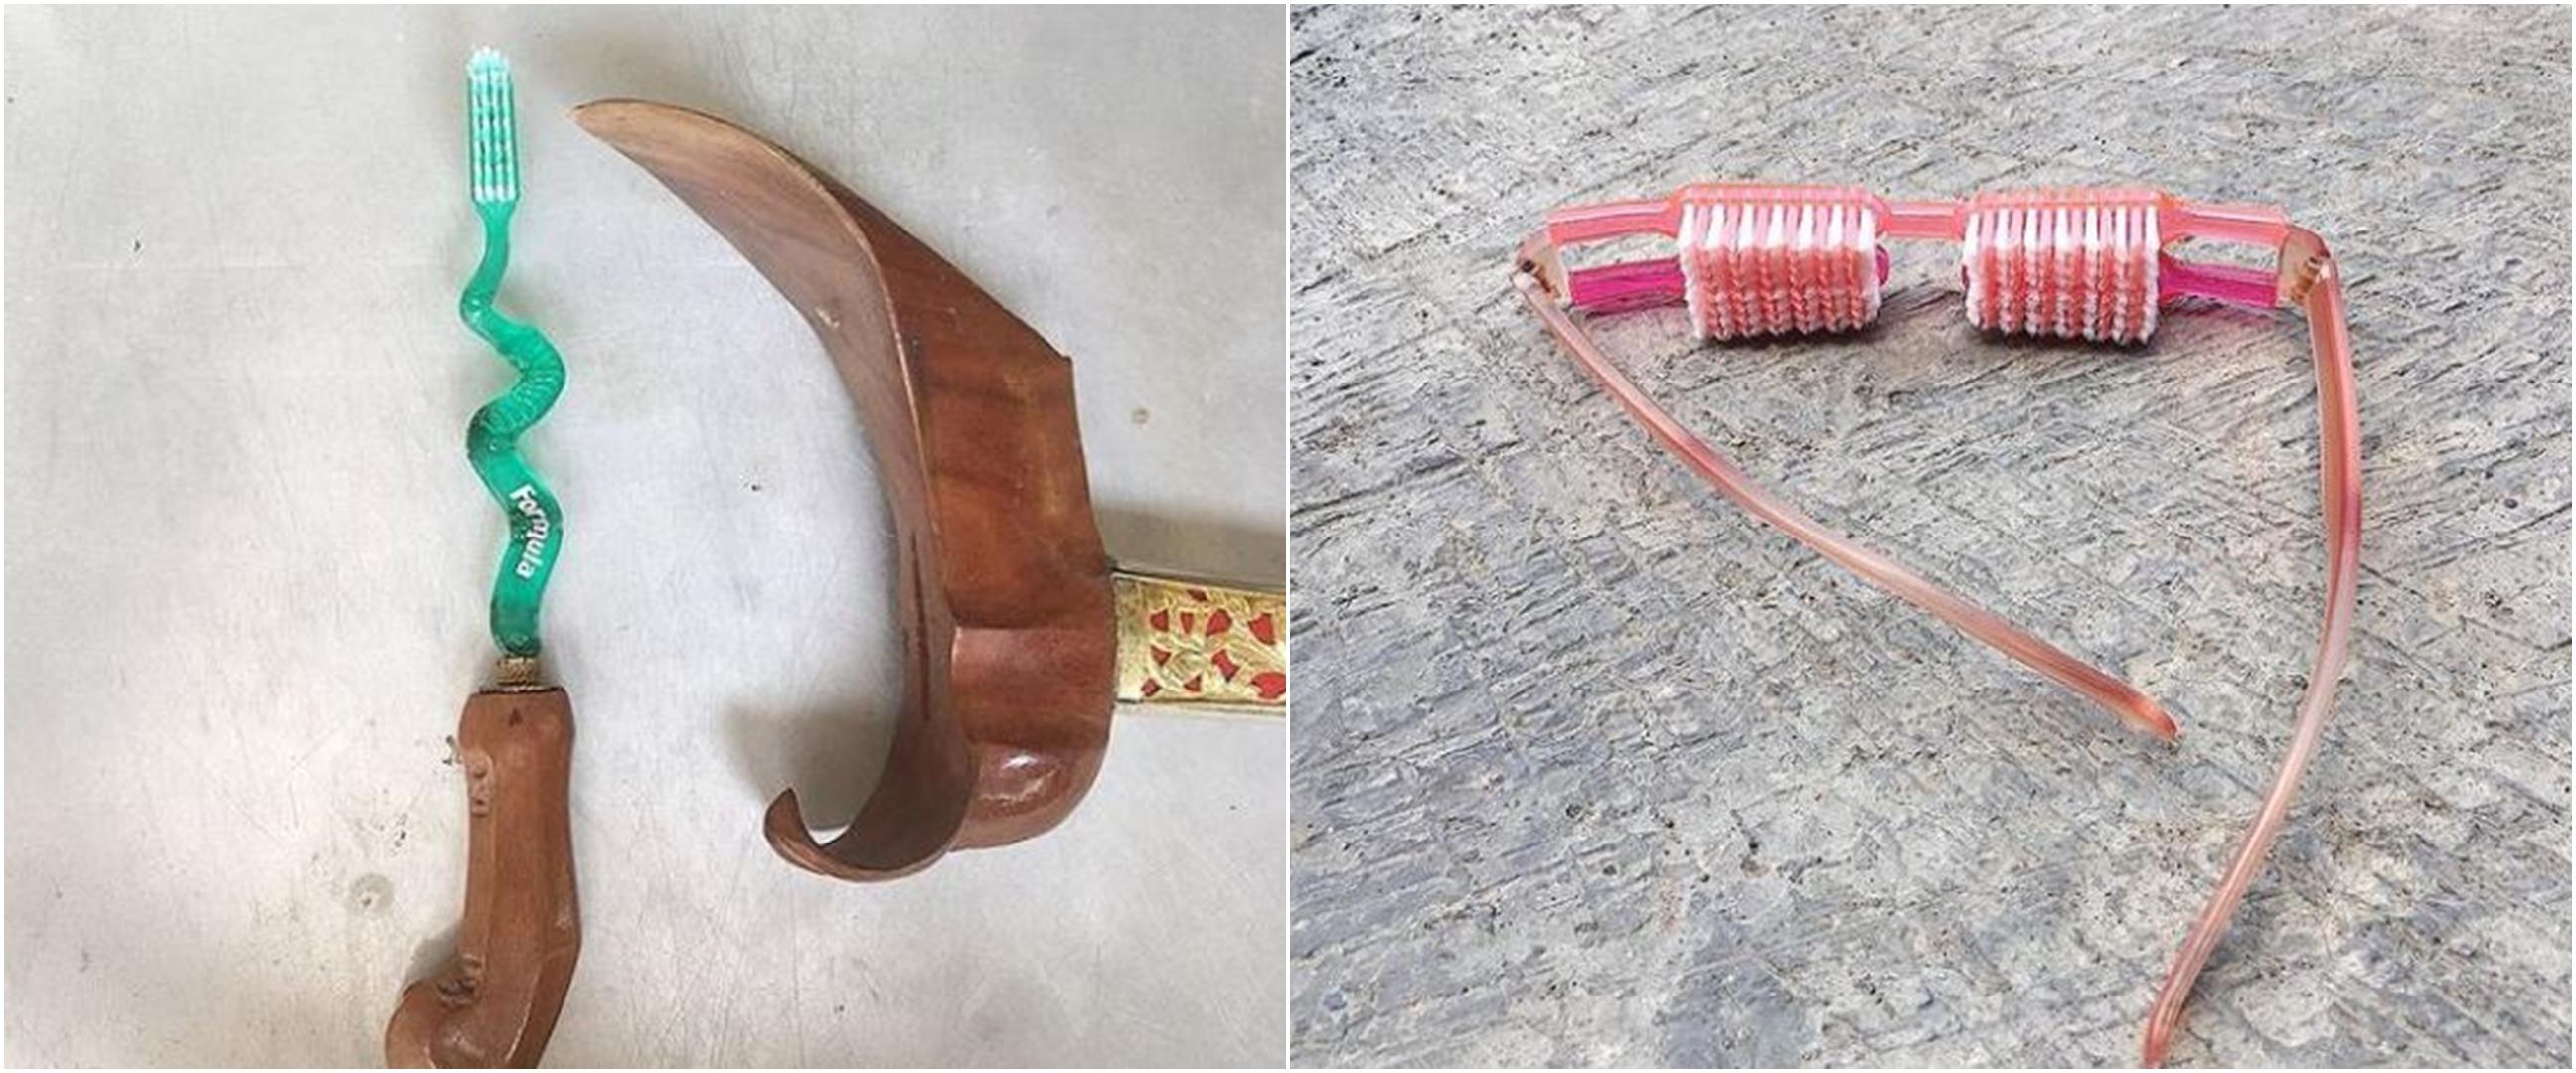 9 Potret lucu sikat gigi ini malah bikin mikir dua kali